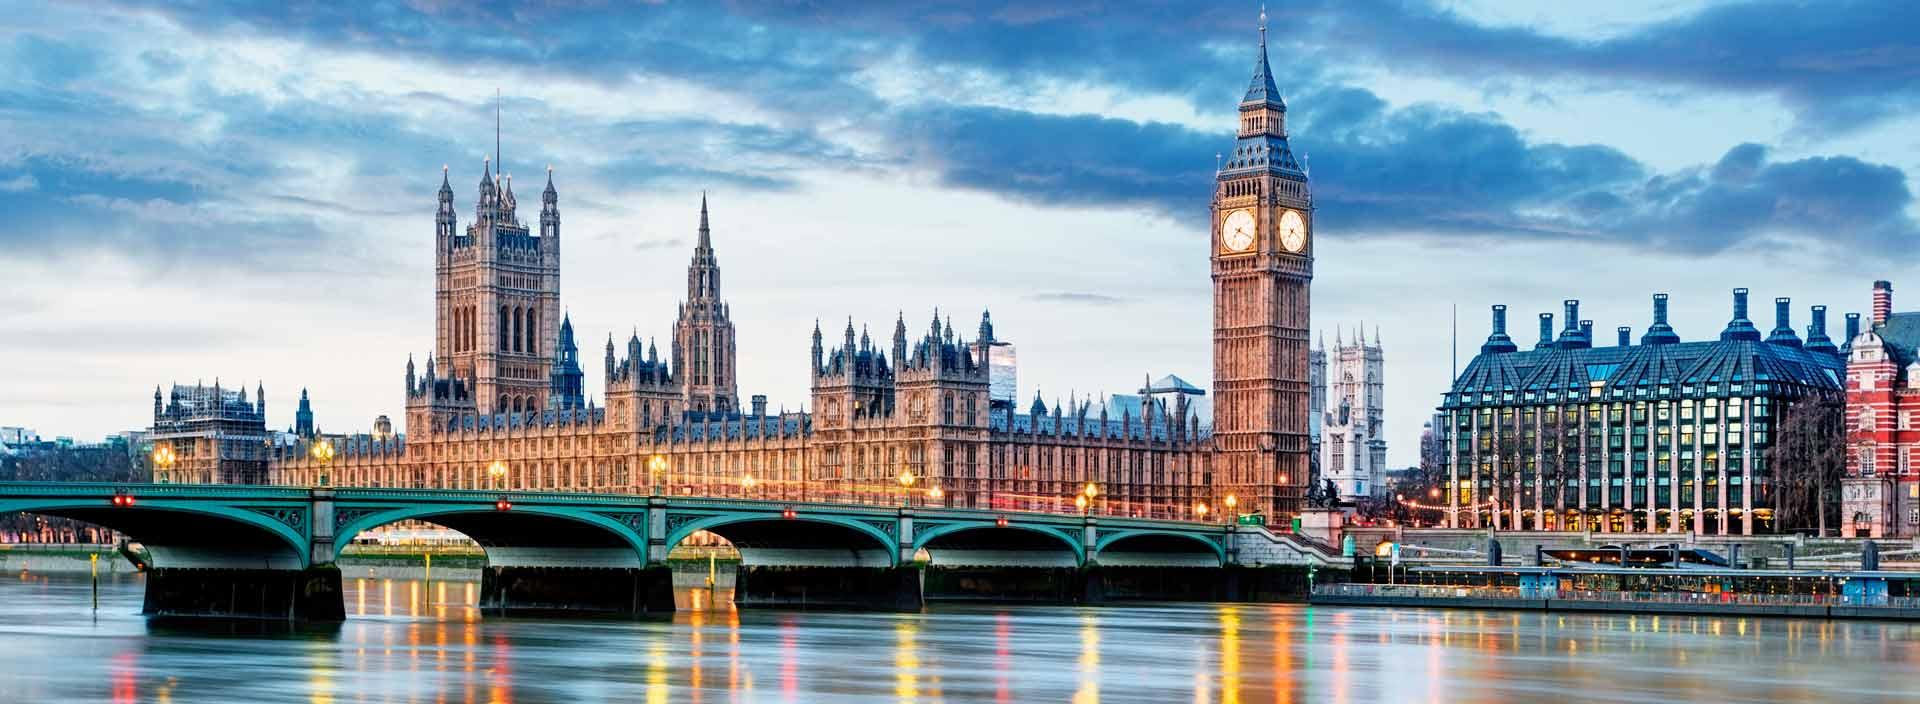 London Mundispain